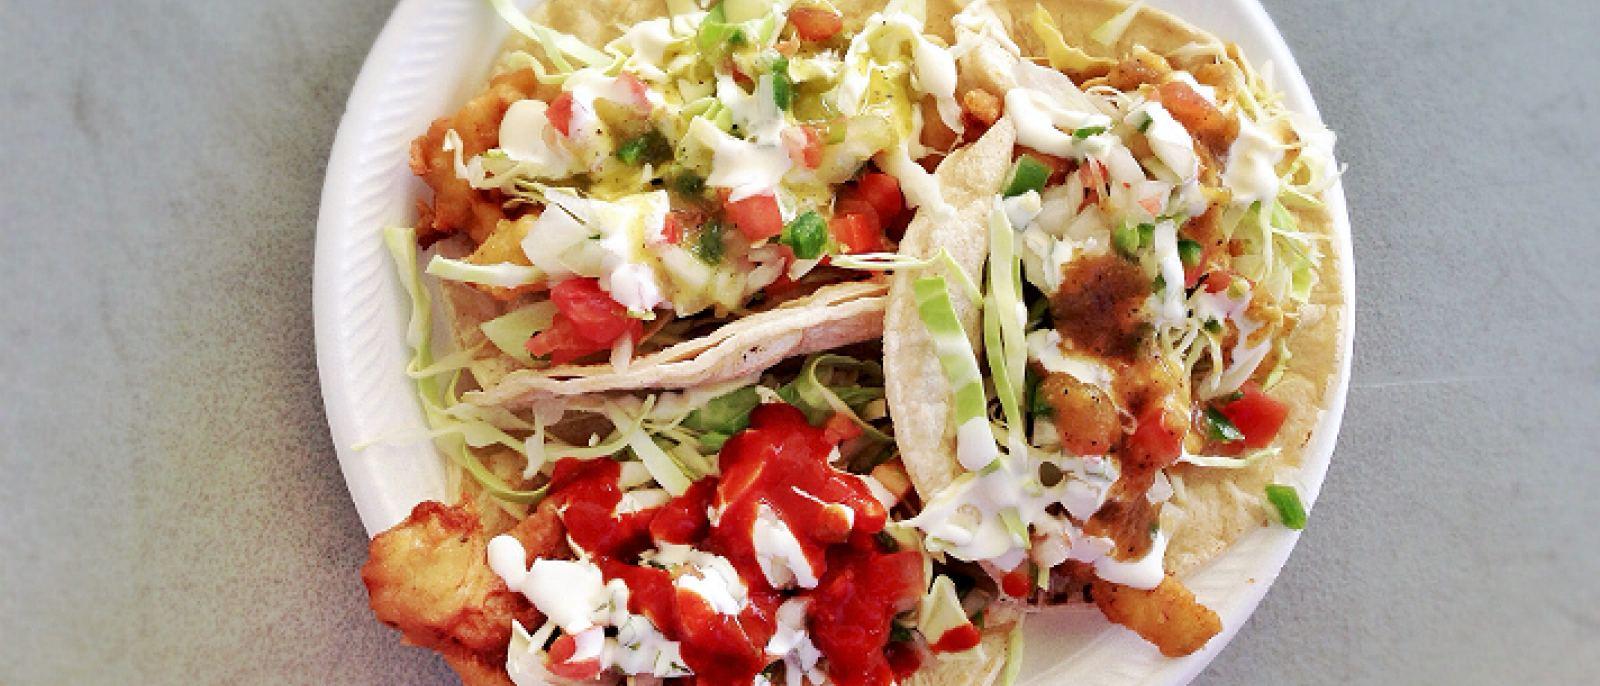 Fish and shrimp tacos at Ricky's Fish Tacos   Photo courtesy of T.Tseng, Flick